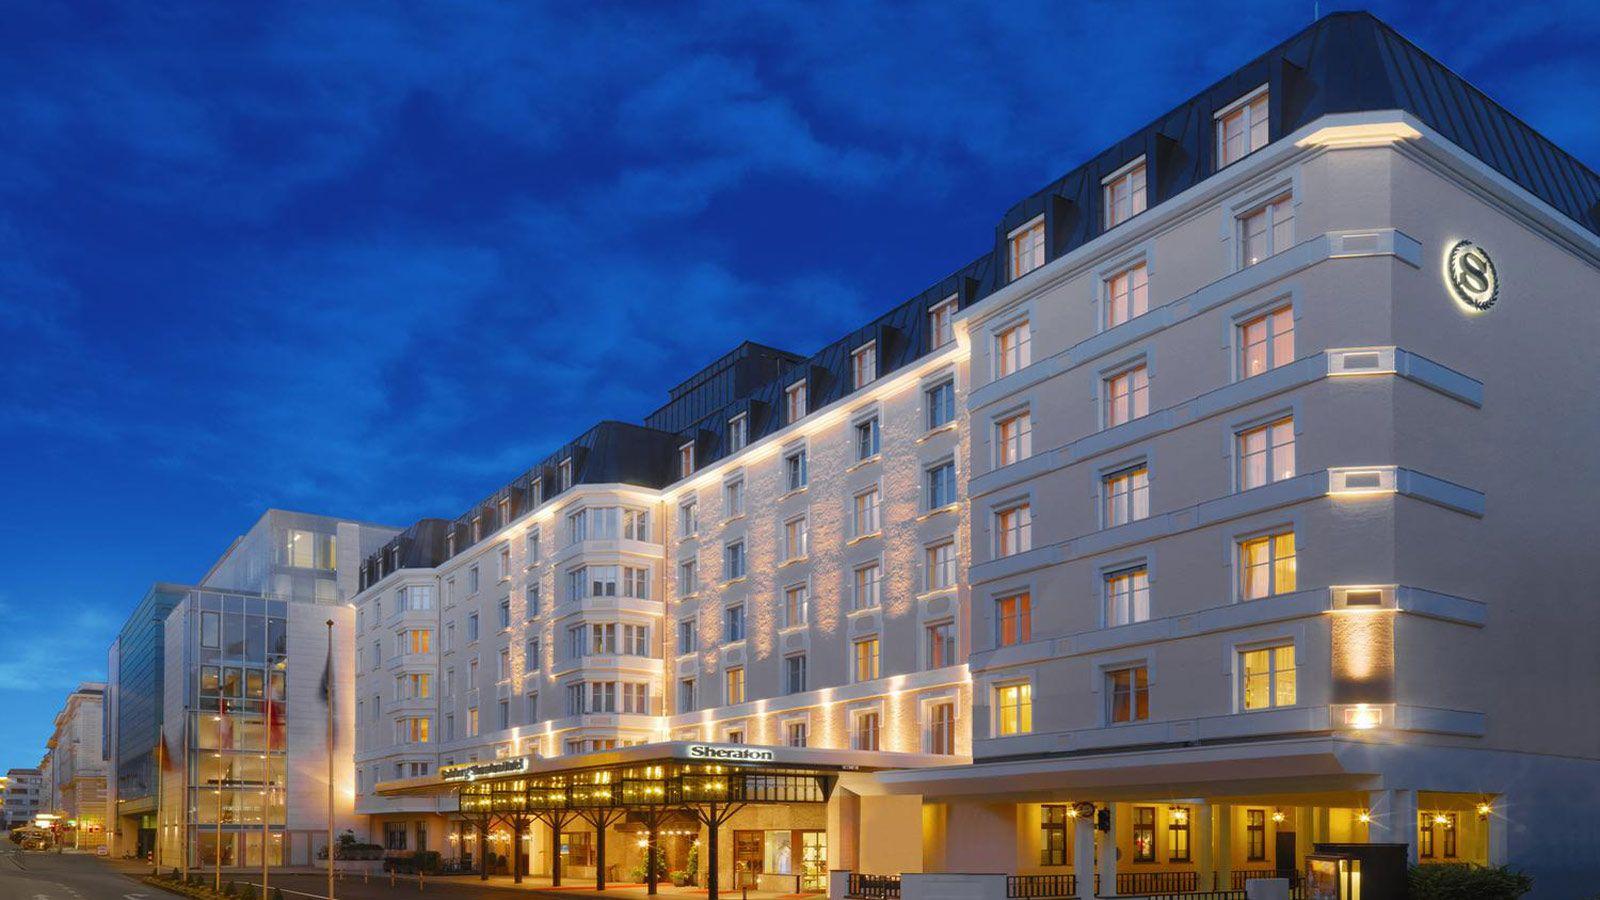 Sheraton grand salzburg debuts in austria kongres for Design boutique hotel salzburg